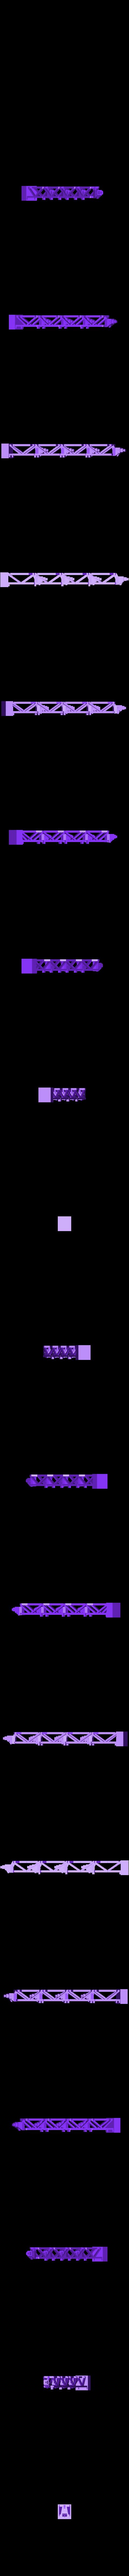 stackable_bisj.stl Télécharger fichier STL gratuit Bisj empilable de base • Design à imprimer en 3D, Slagerqod